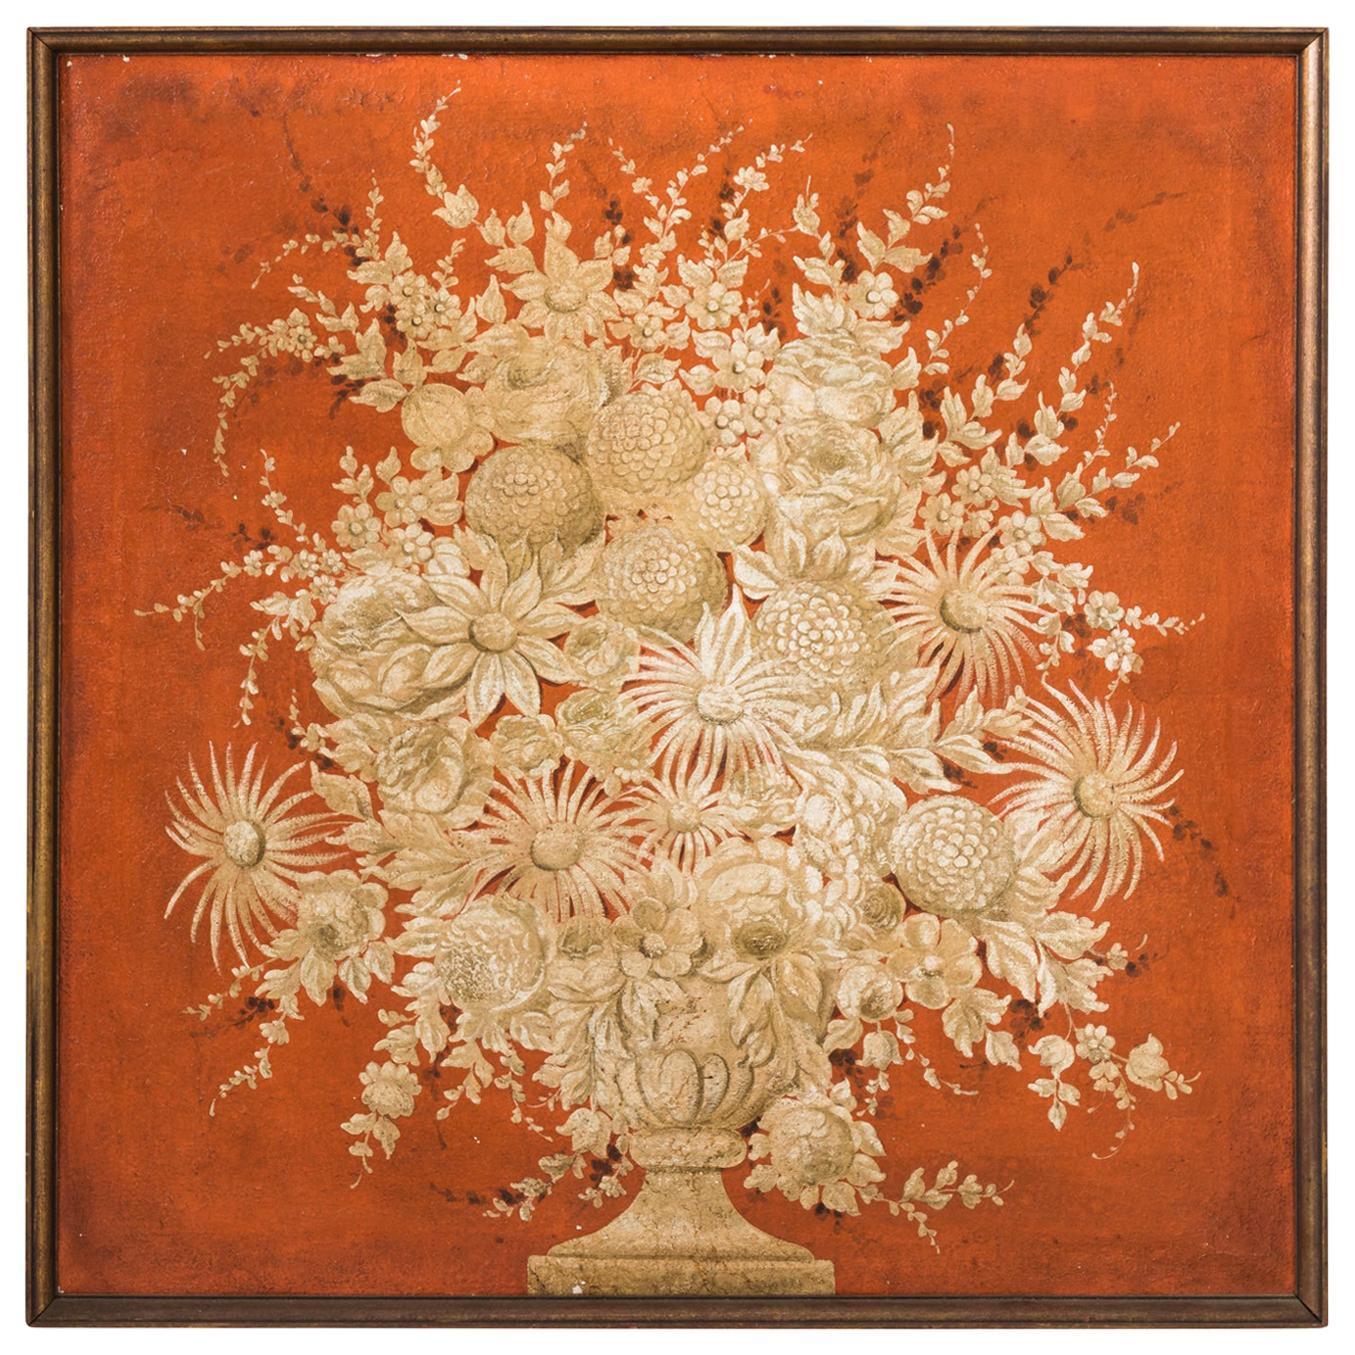 Grissaille Painting of Flower Arrangements